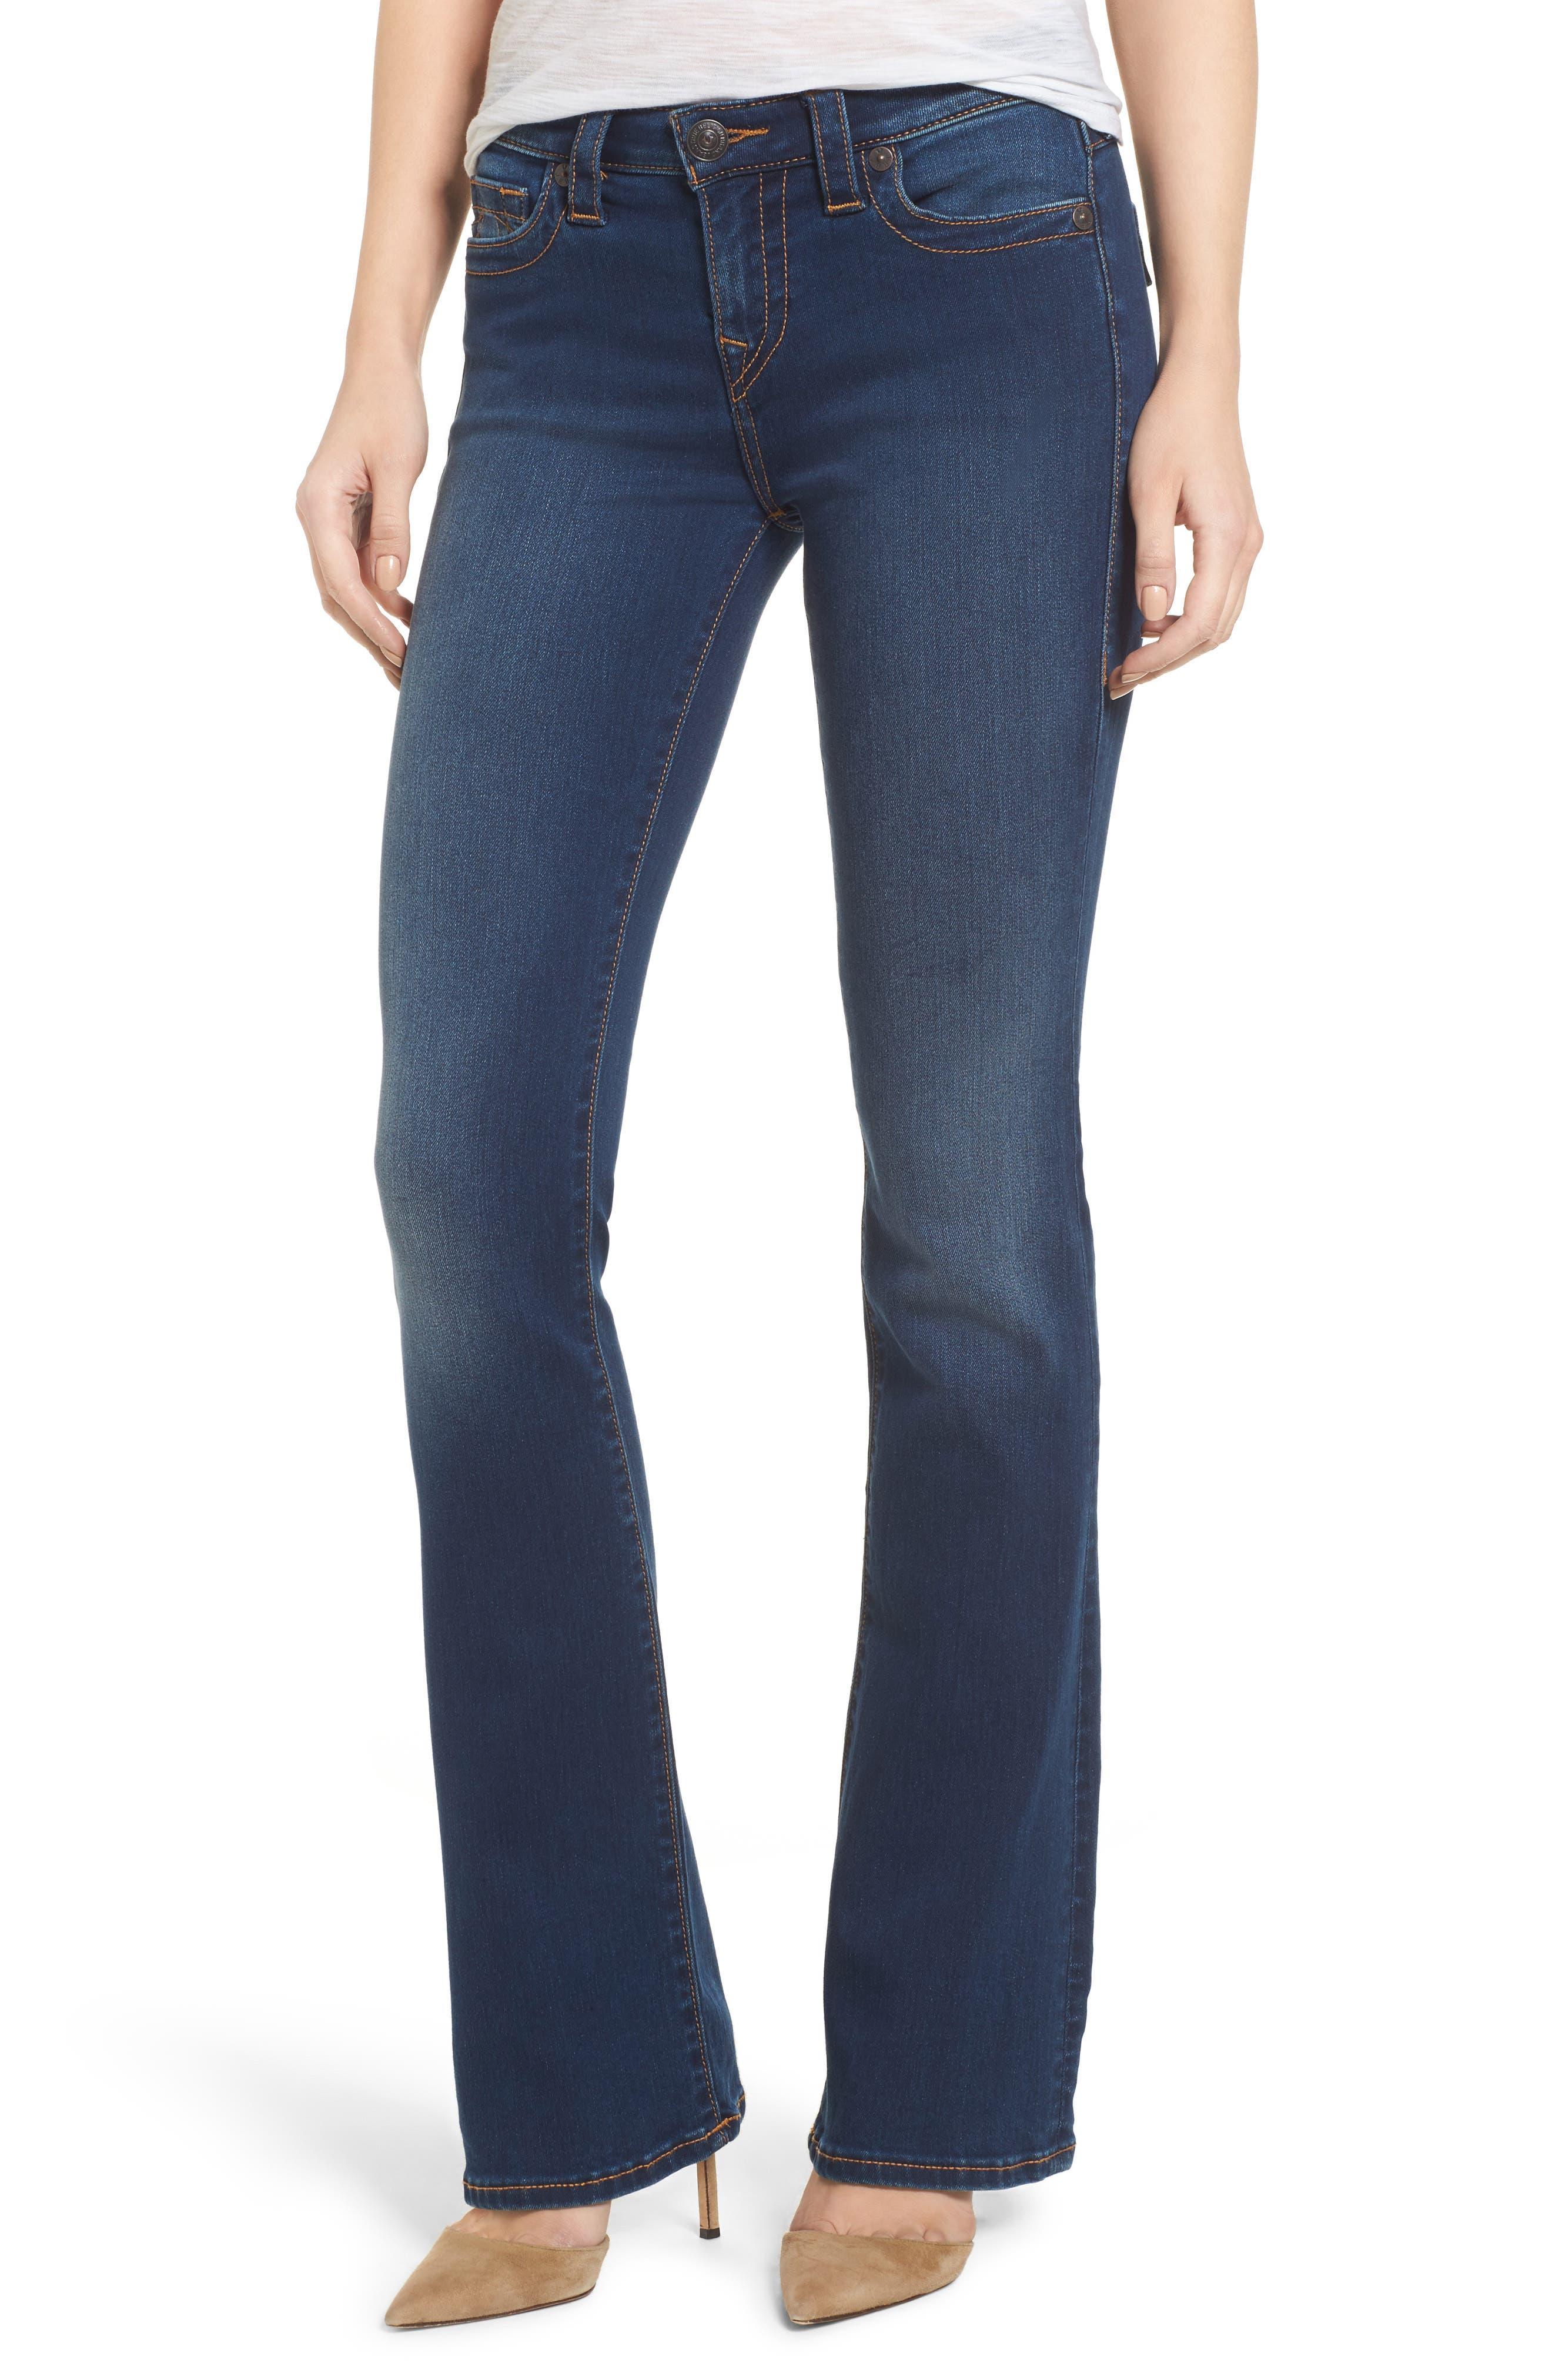 Lands end womens bootcut jeans